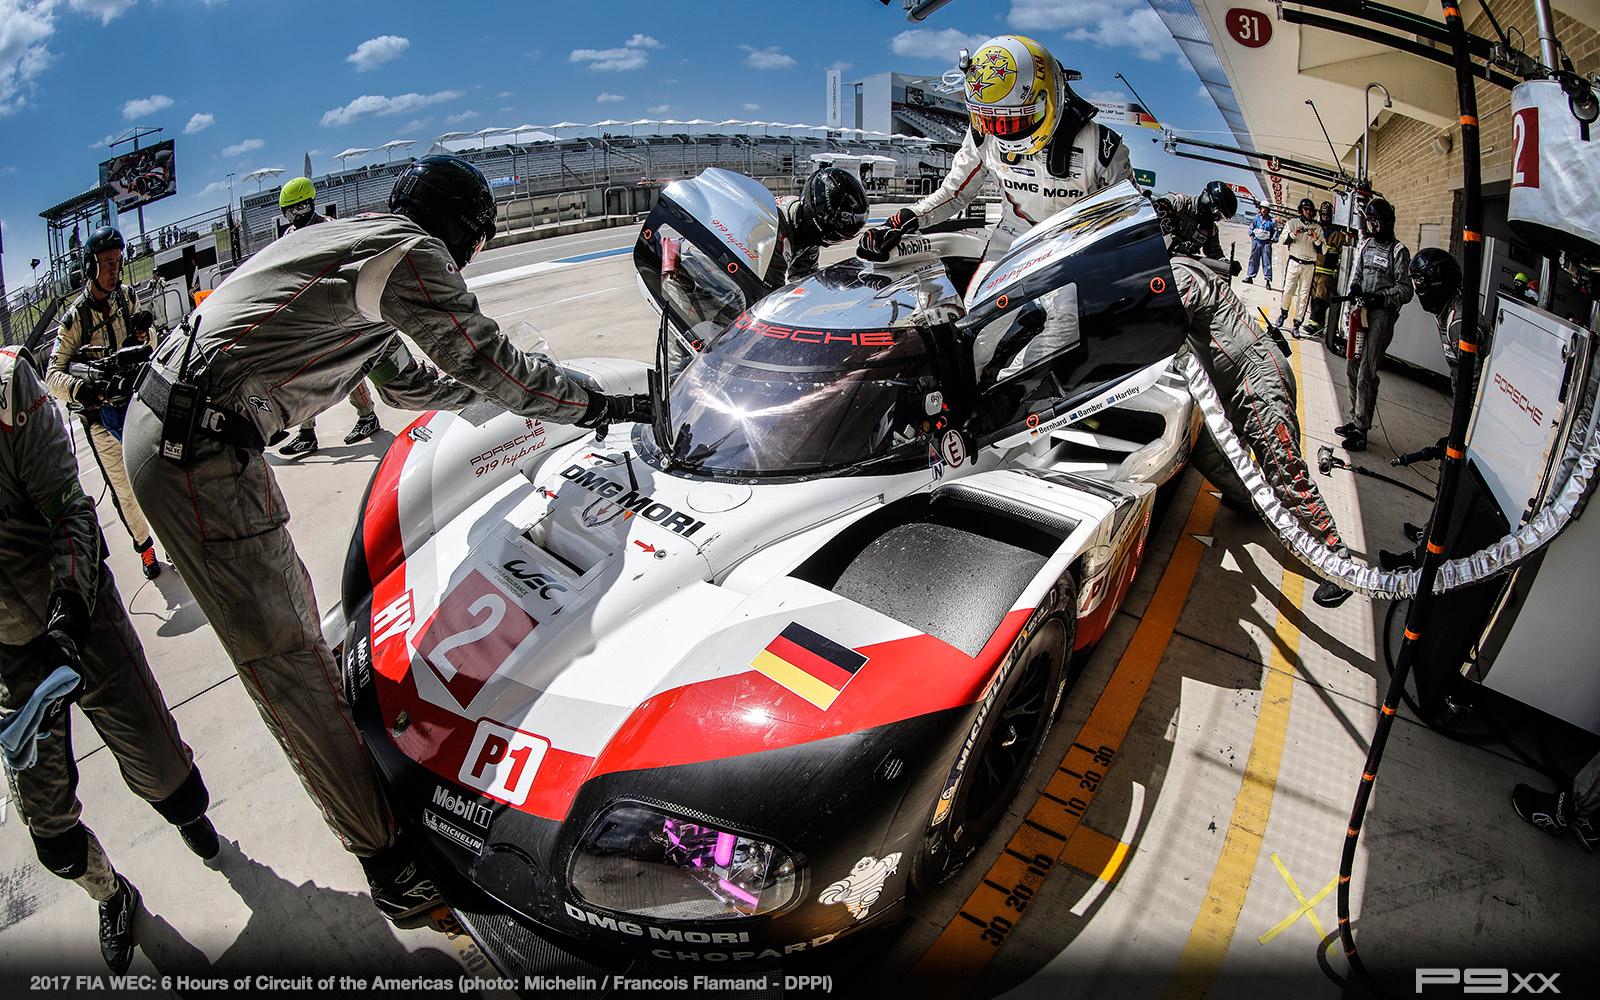 2017-FIA-WEC-6-HOURS-OF-COTA-PORSCHE-stin_02117009_3807292